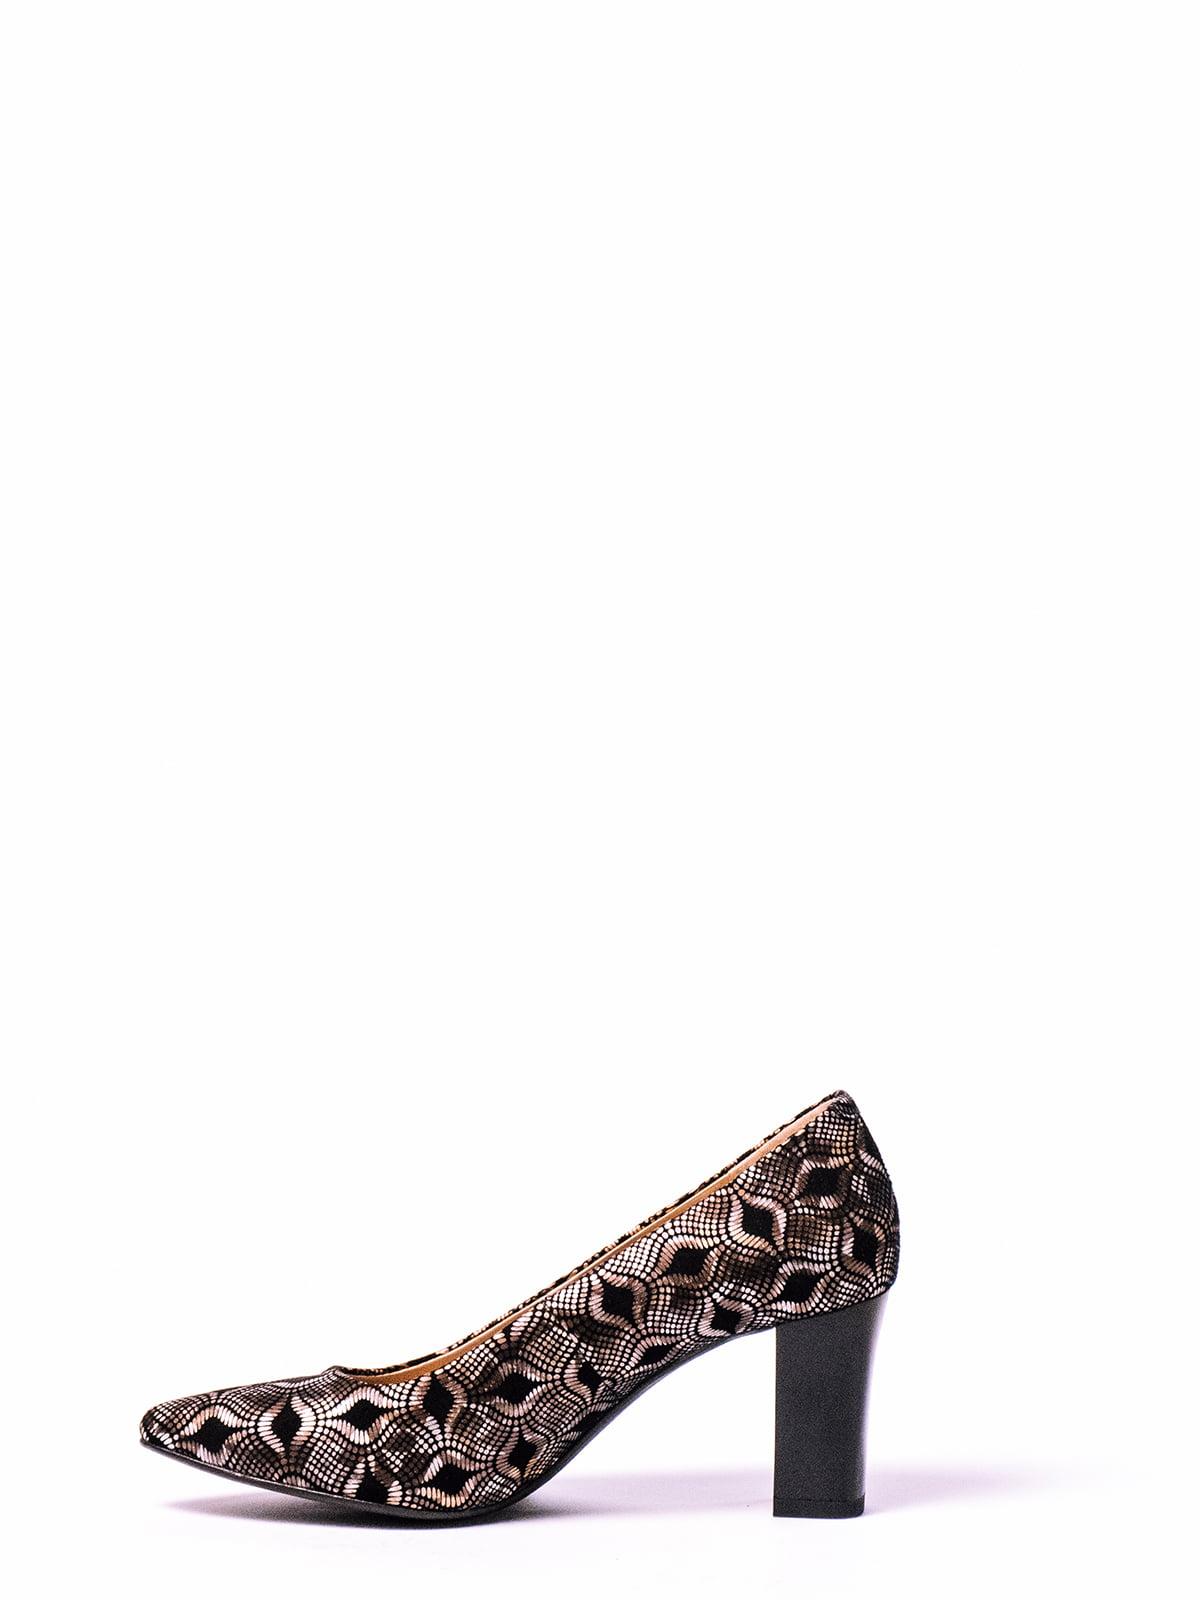 Туфли бронзового цвета с рисунком | 4860332 | фото 2